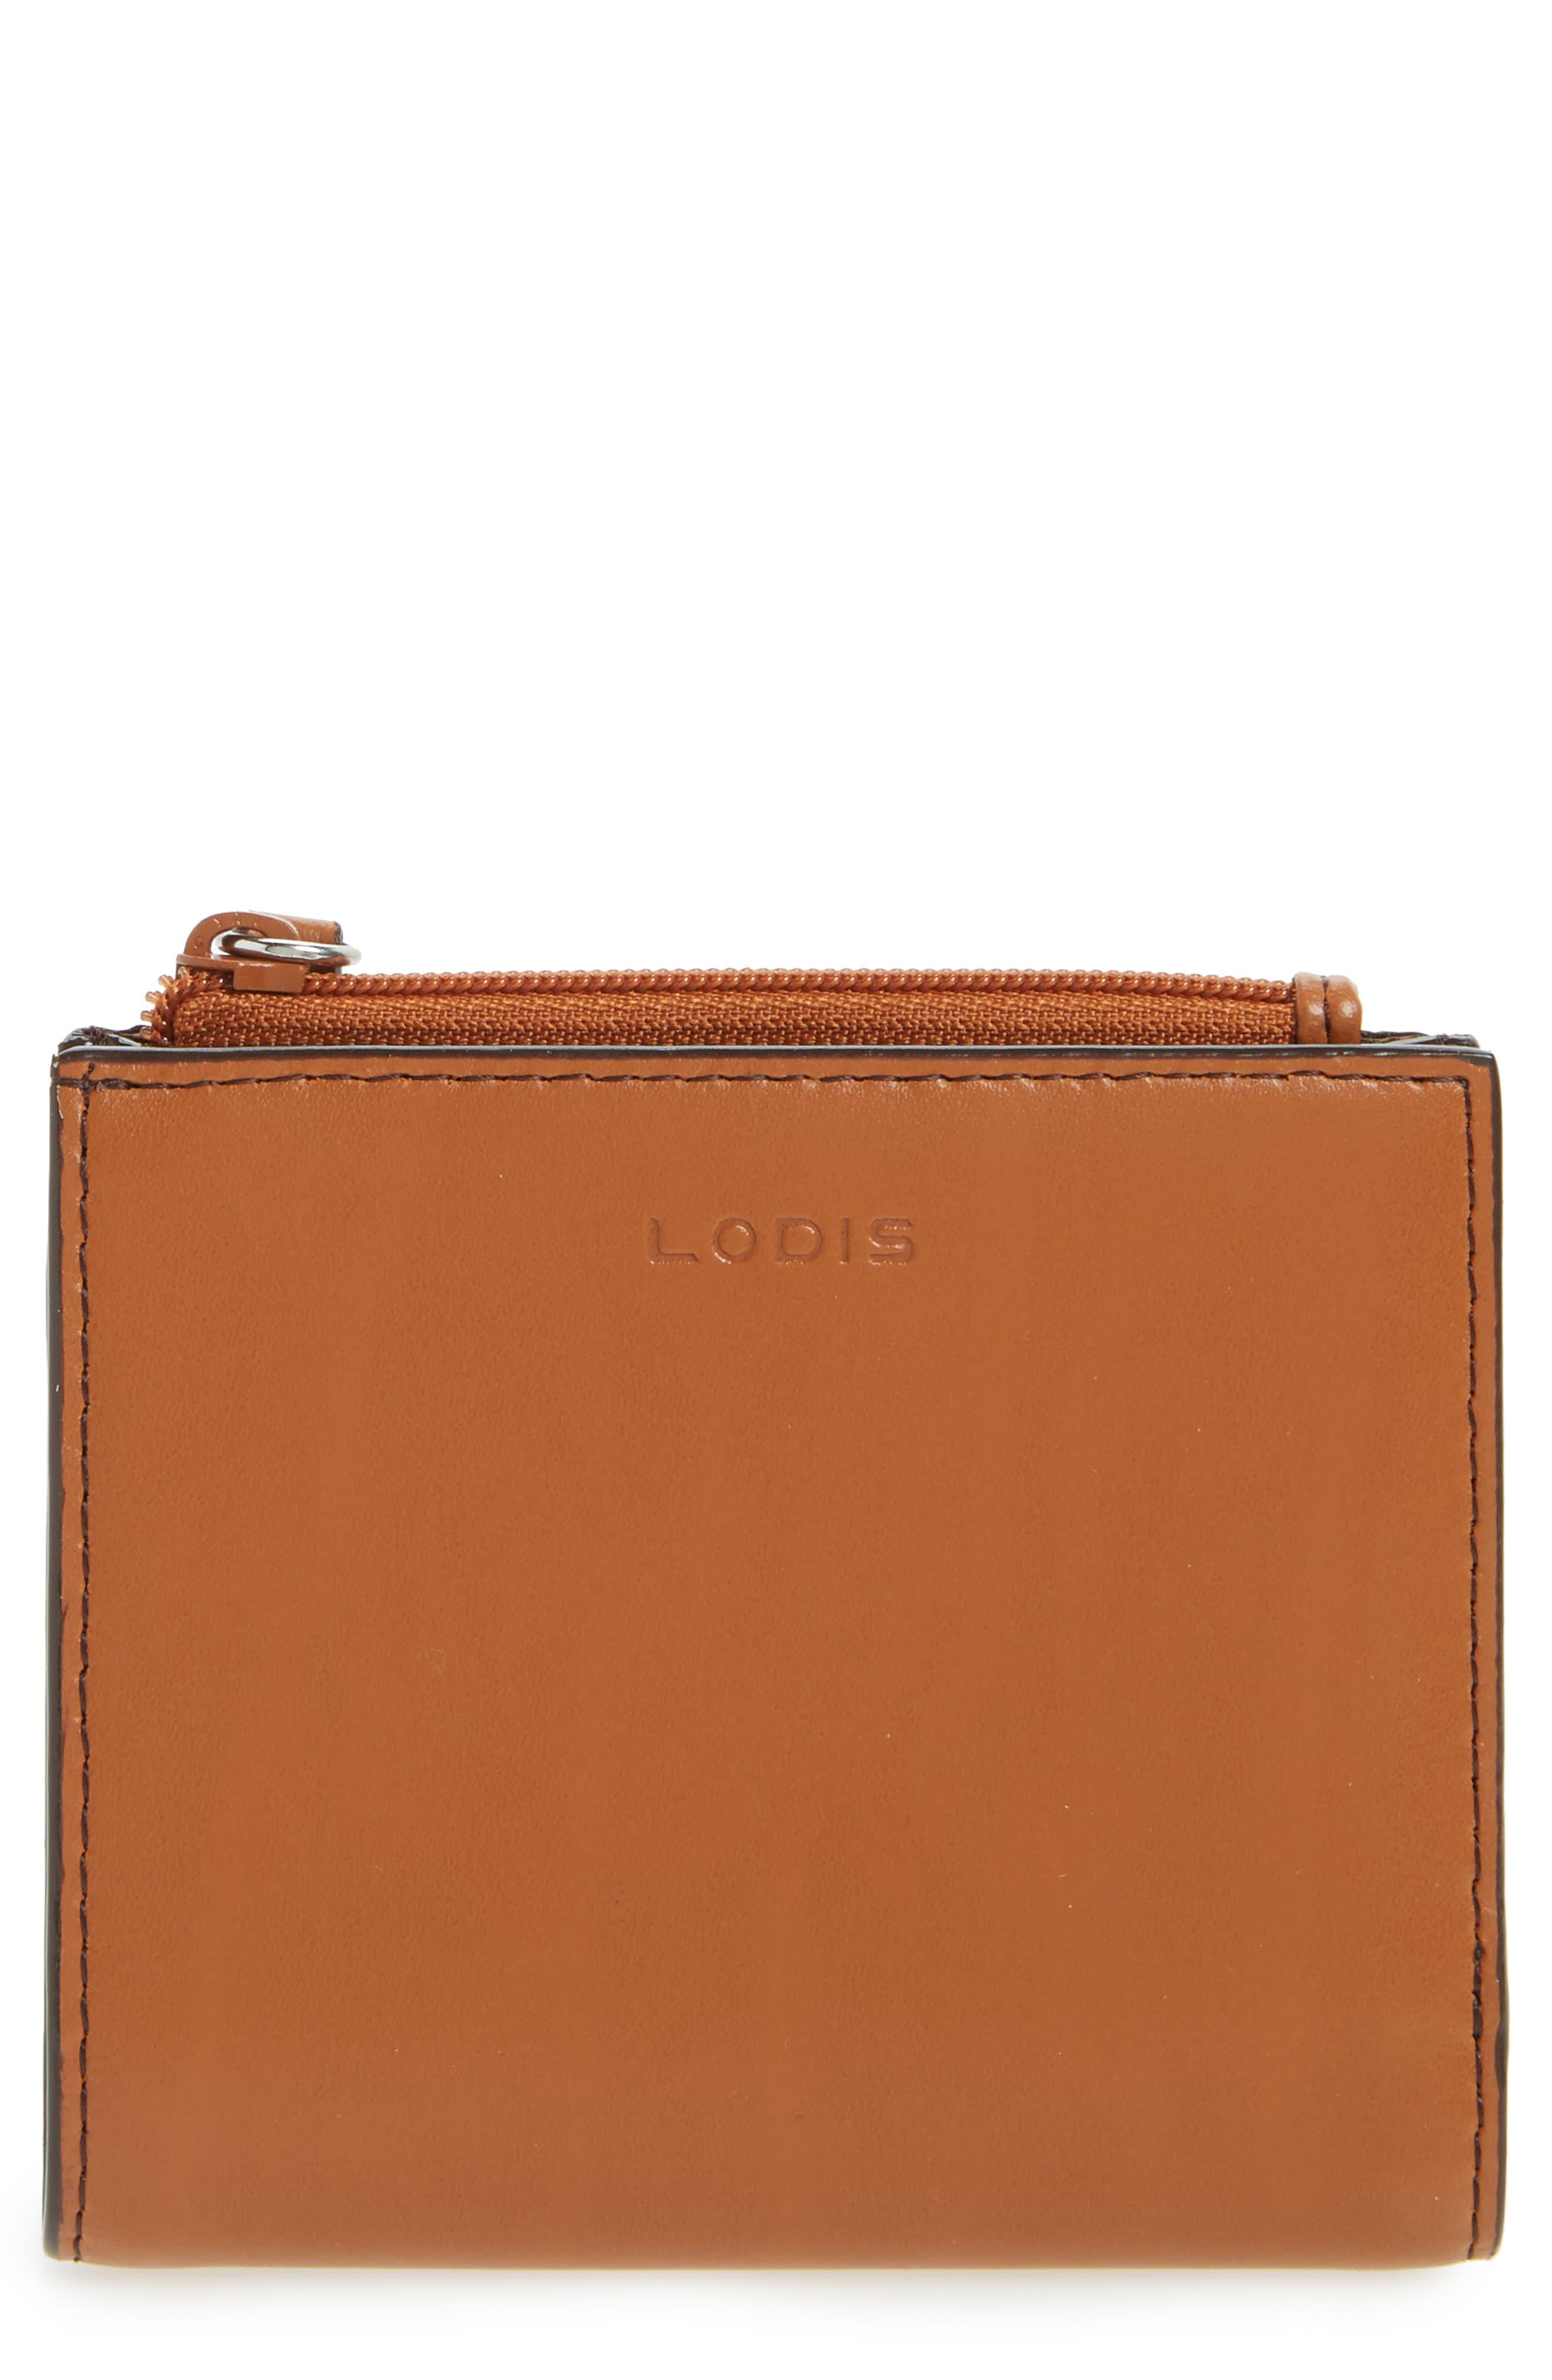 Main Image - LODIS Audrey Under Lock & Key Aldis Leather Wallet